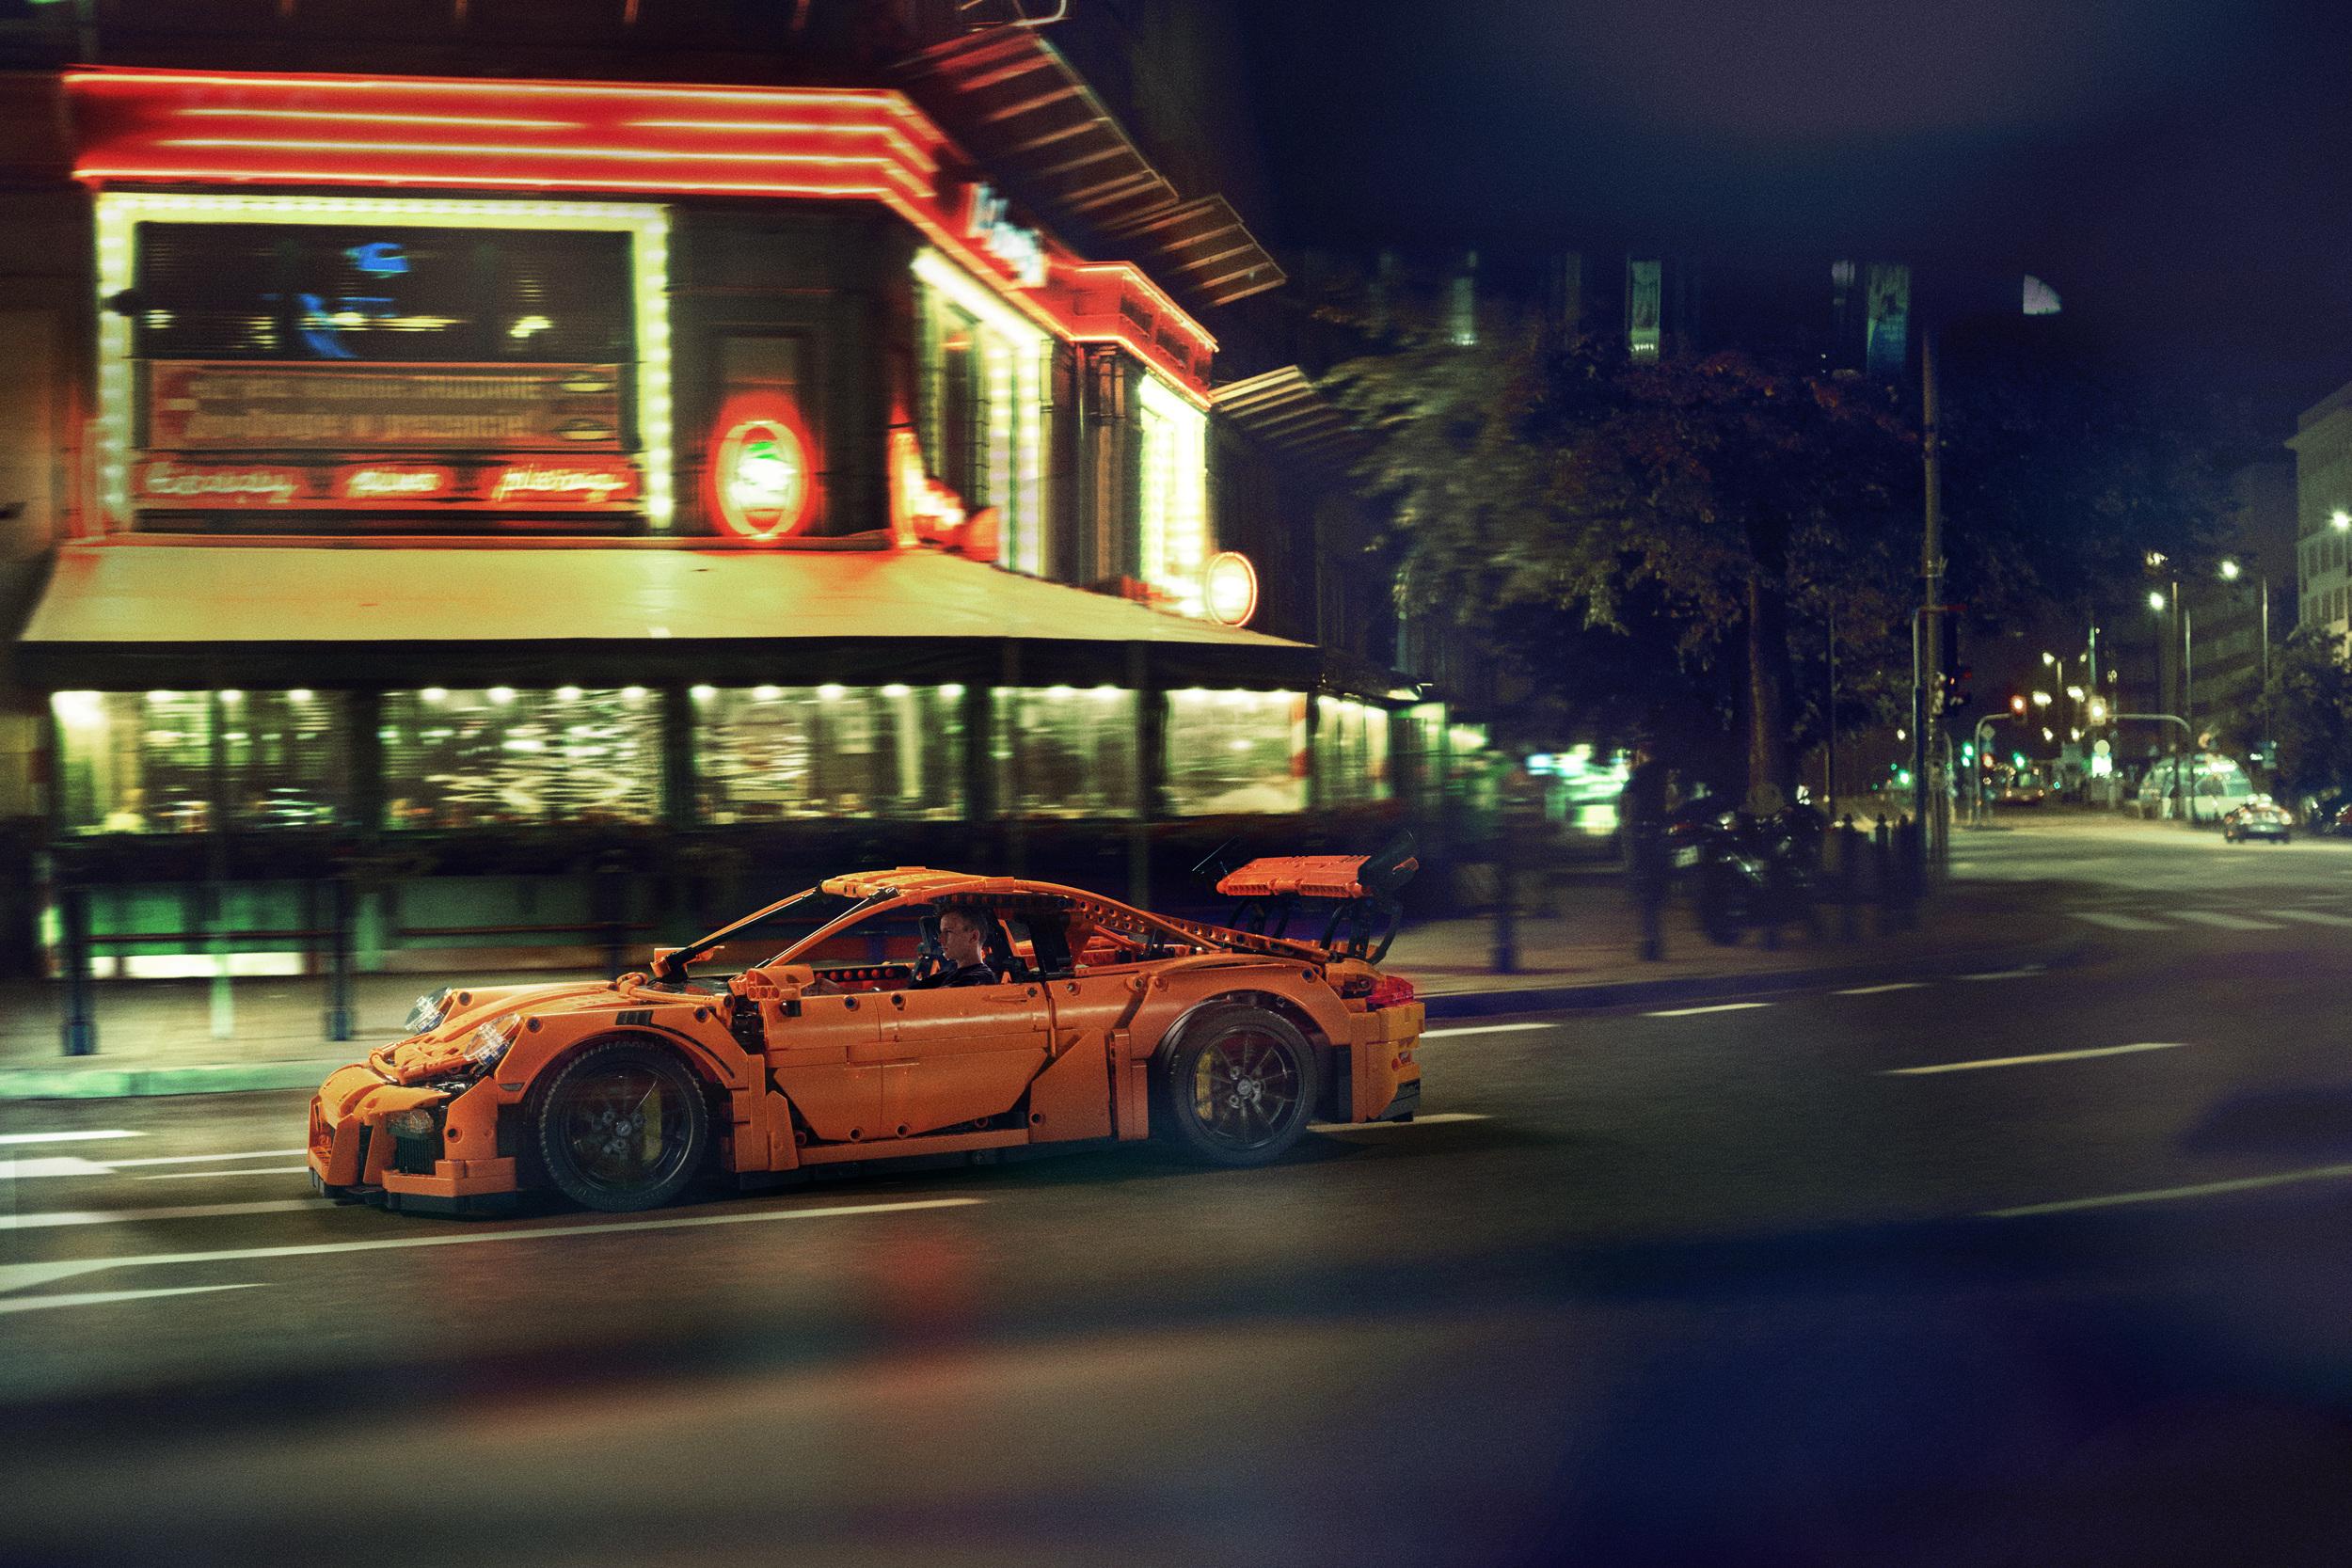 Lego Technic 911 GT3 RS